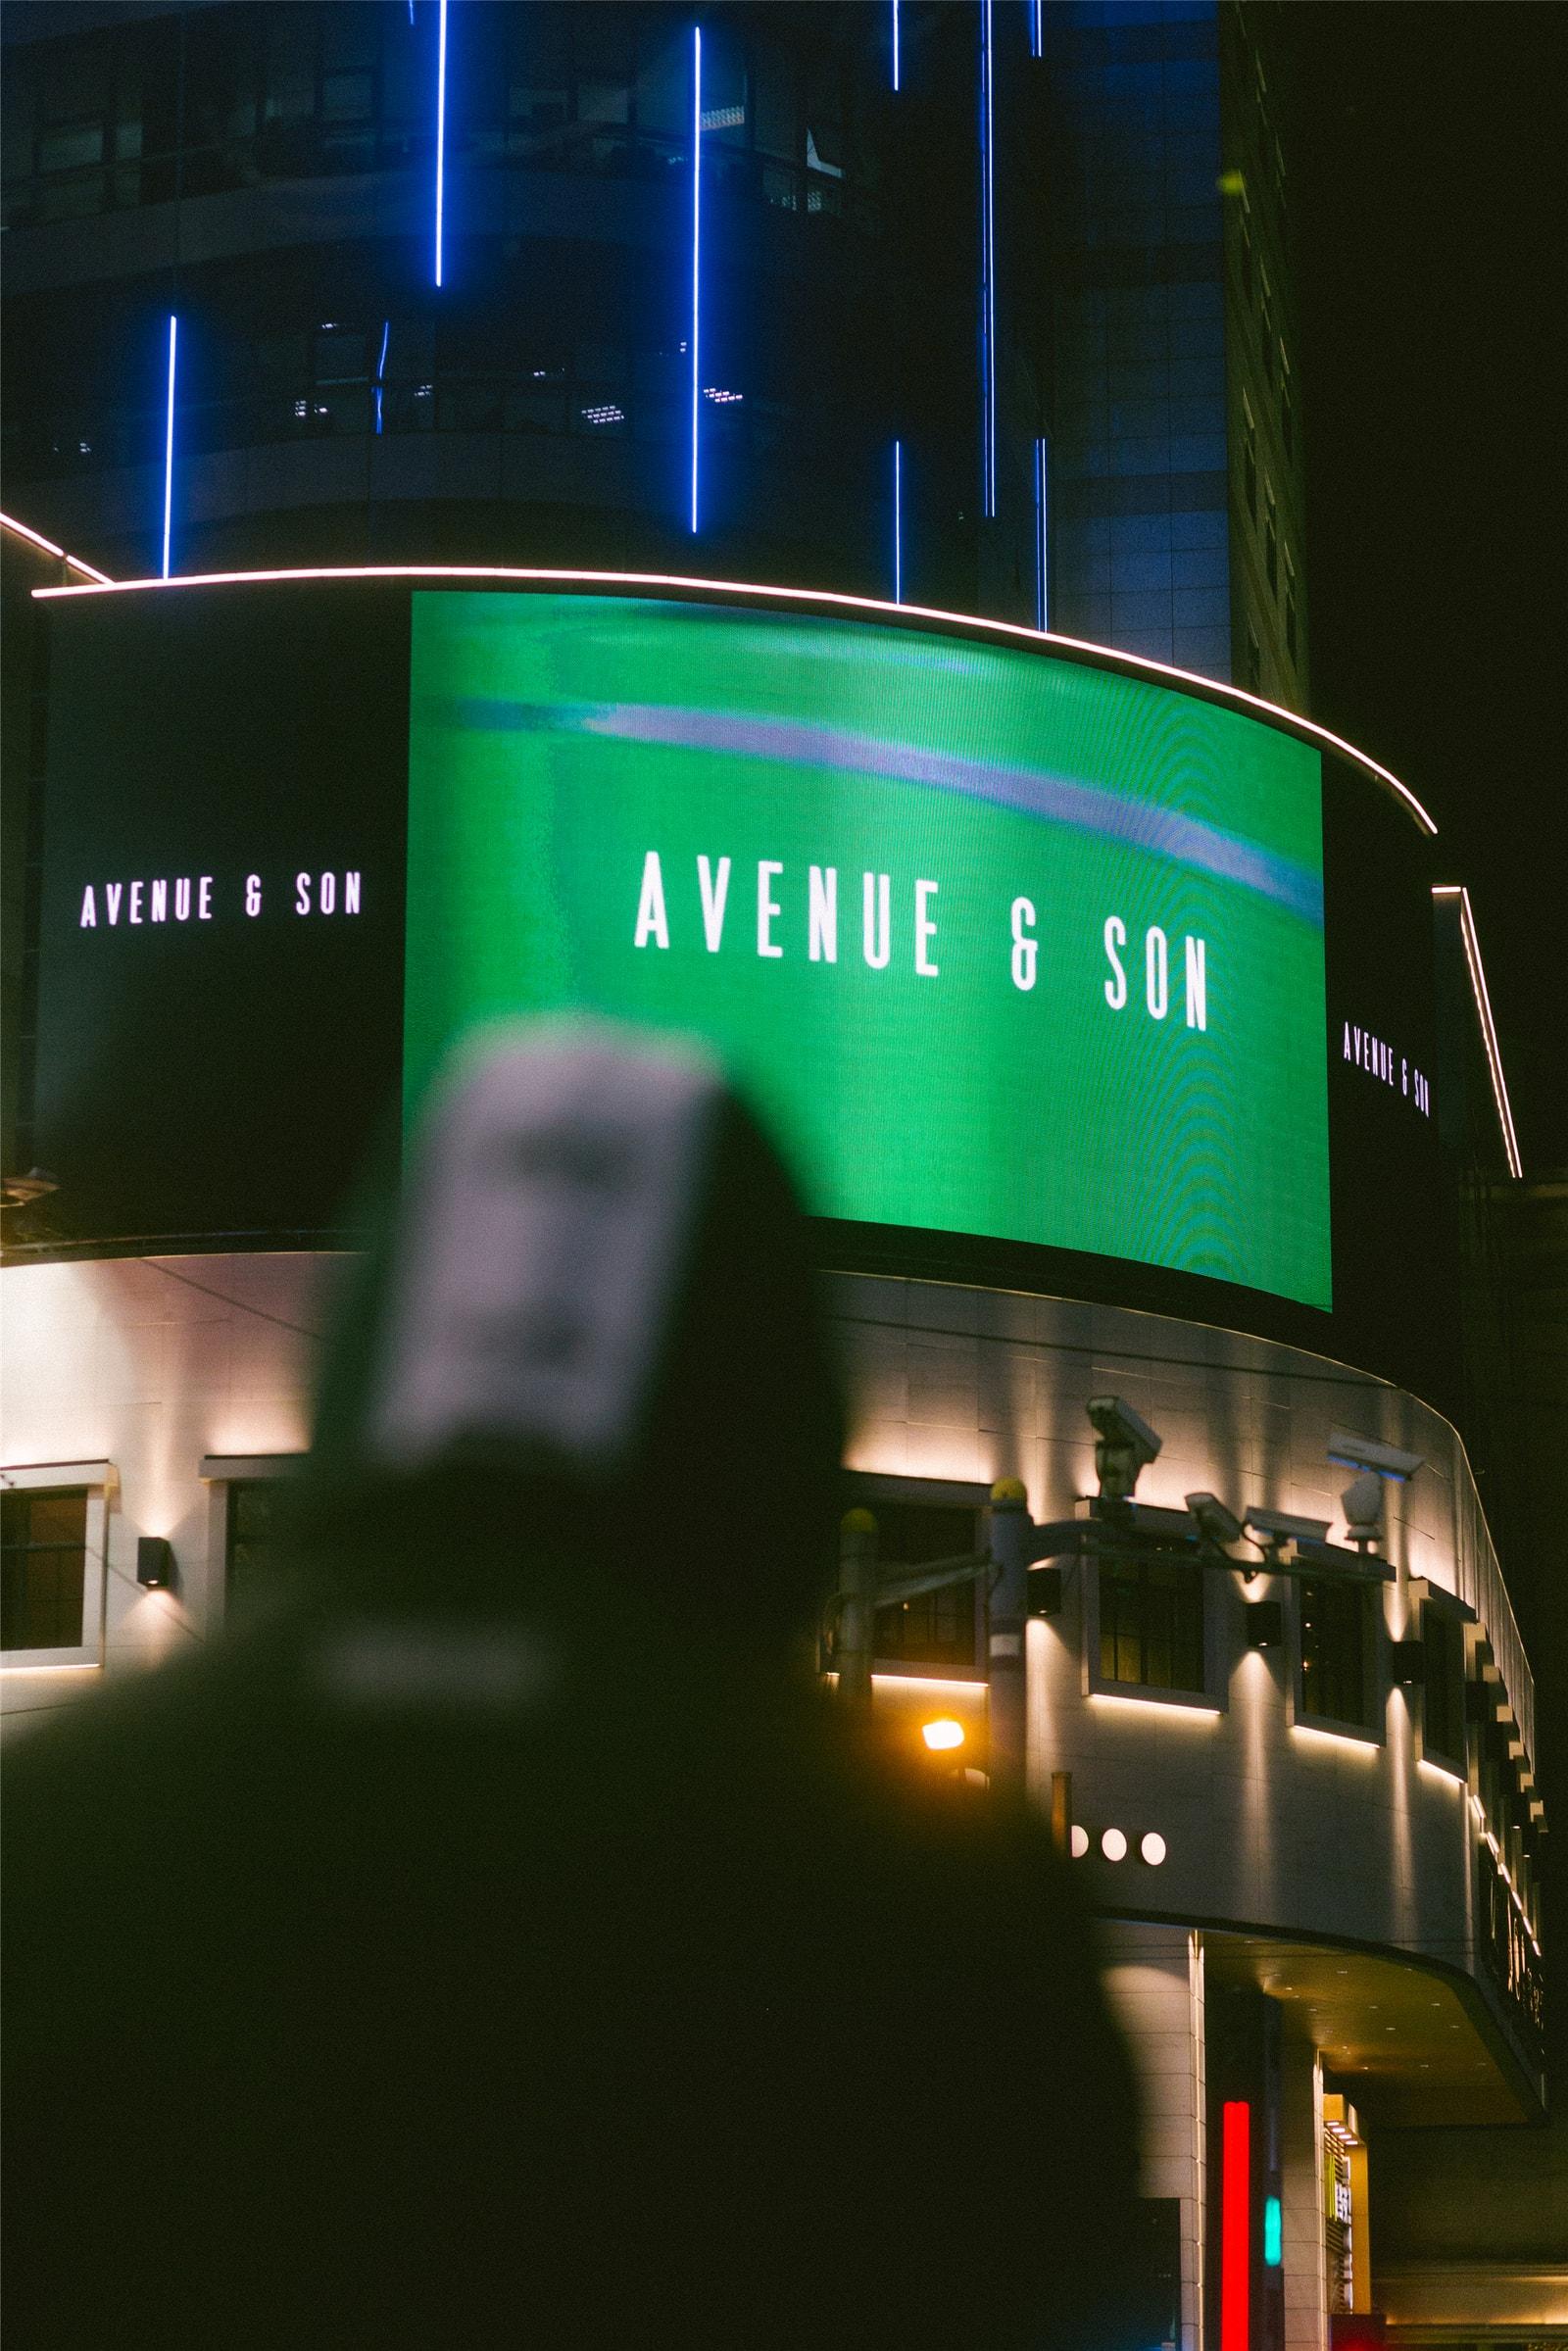 AVENUE & SON 淮海中路大屏幕投放影片外,滑板品牌在中国还做过什么动作?